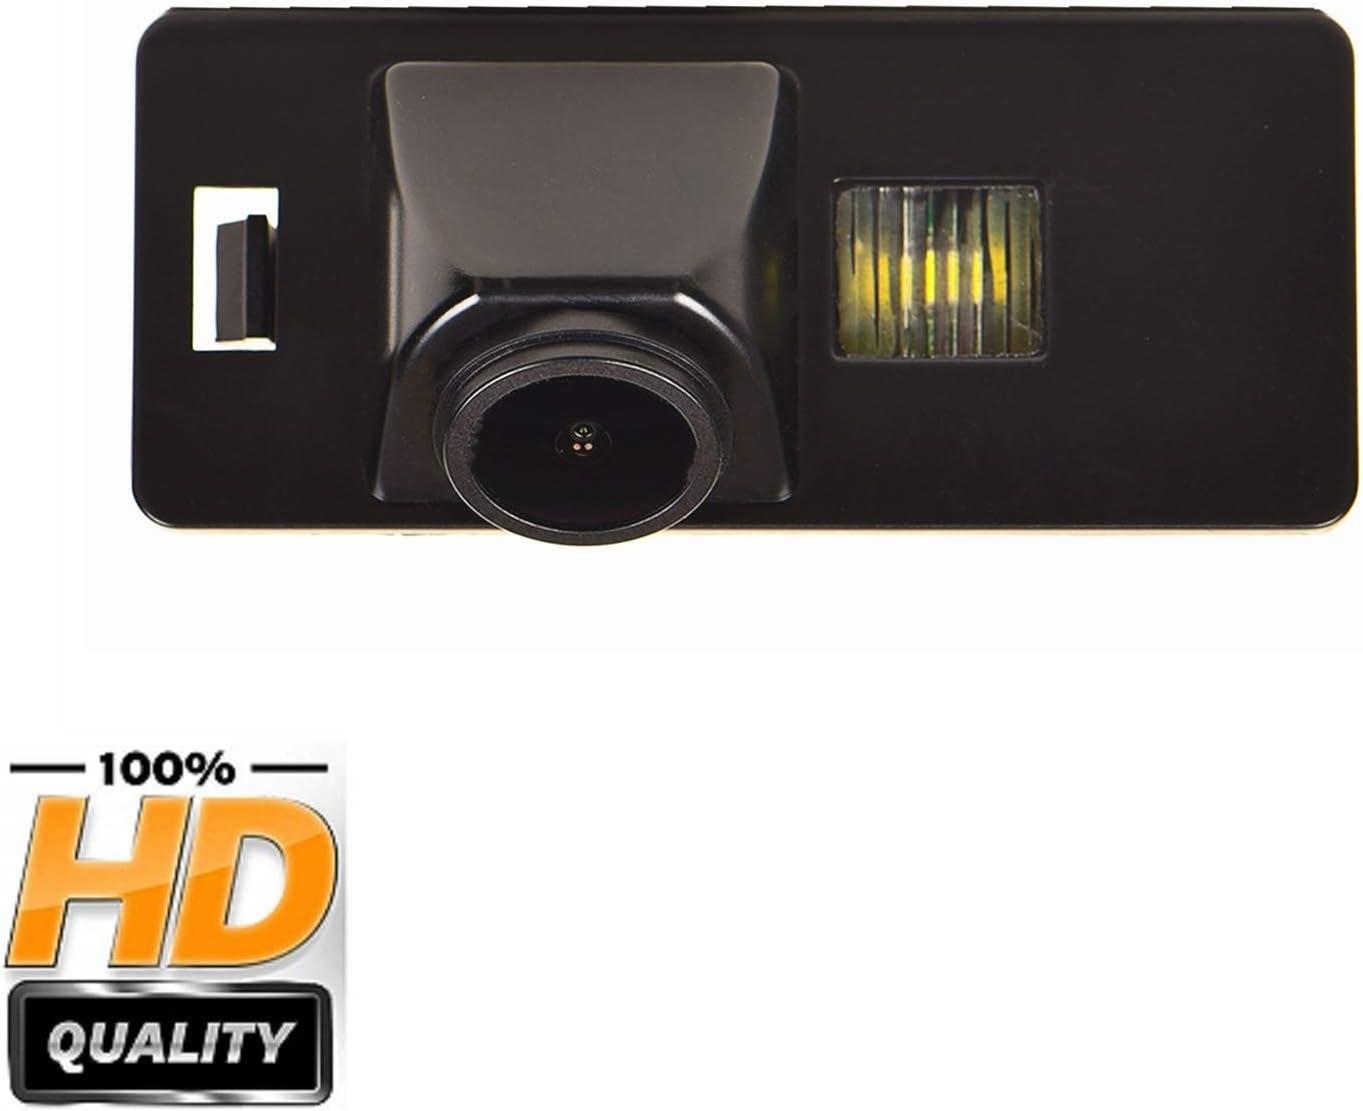 HD 1280x720p Reversing Camera Rear View Backup Camera Waterproof Night Vision for Audi A3 8P 8V S3 A4 B6 B7 B8 S4 A6 C6 S6 RS6 A8 RS4 TT 8N Q3 Q5 Q7 A= Screw Hole Style